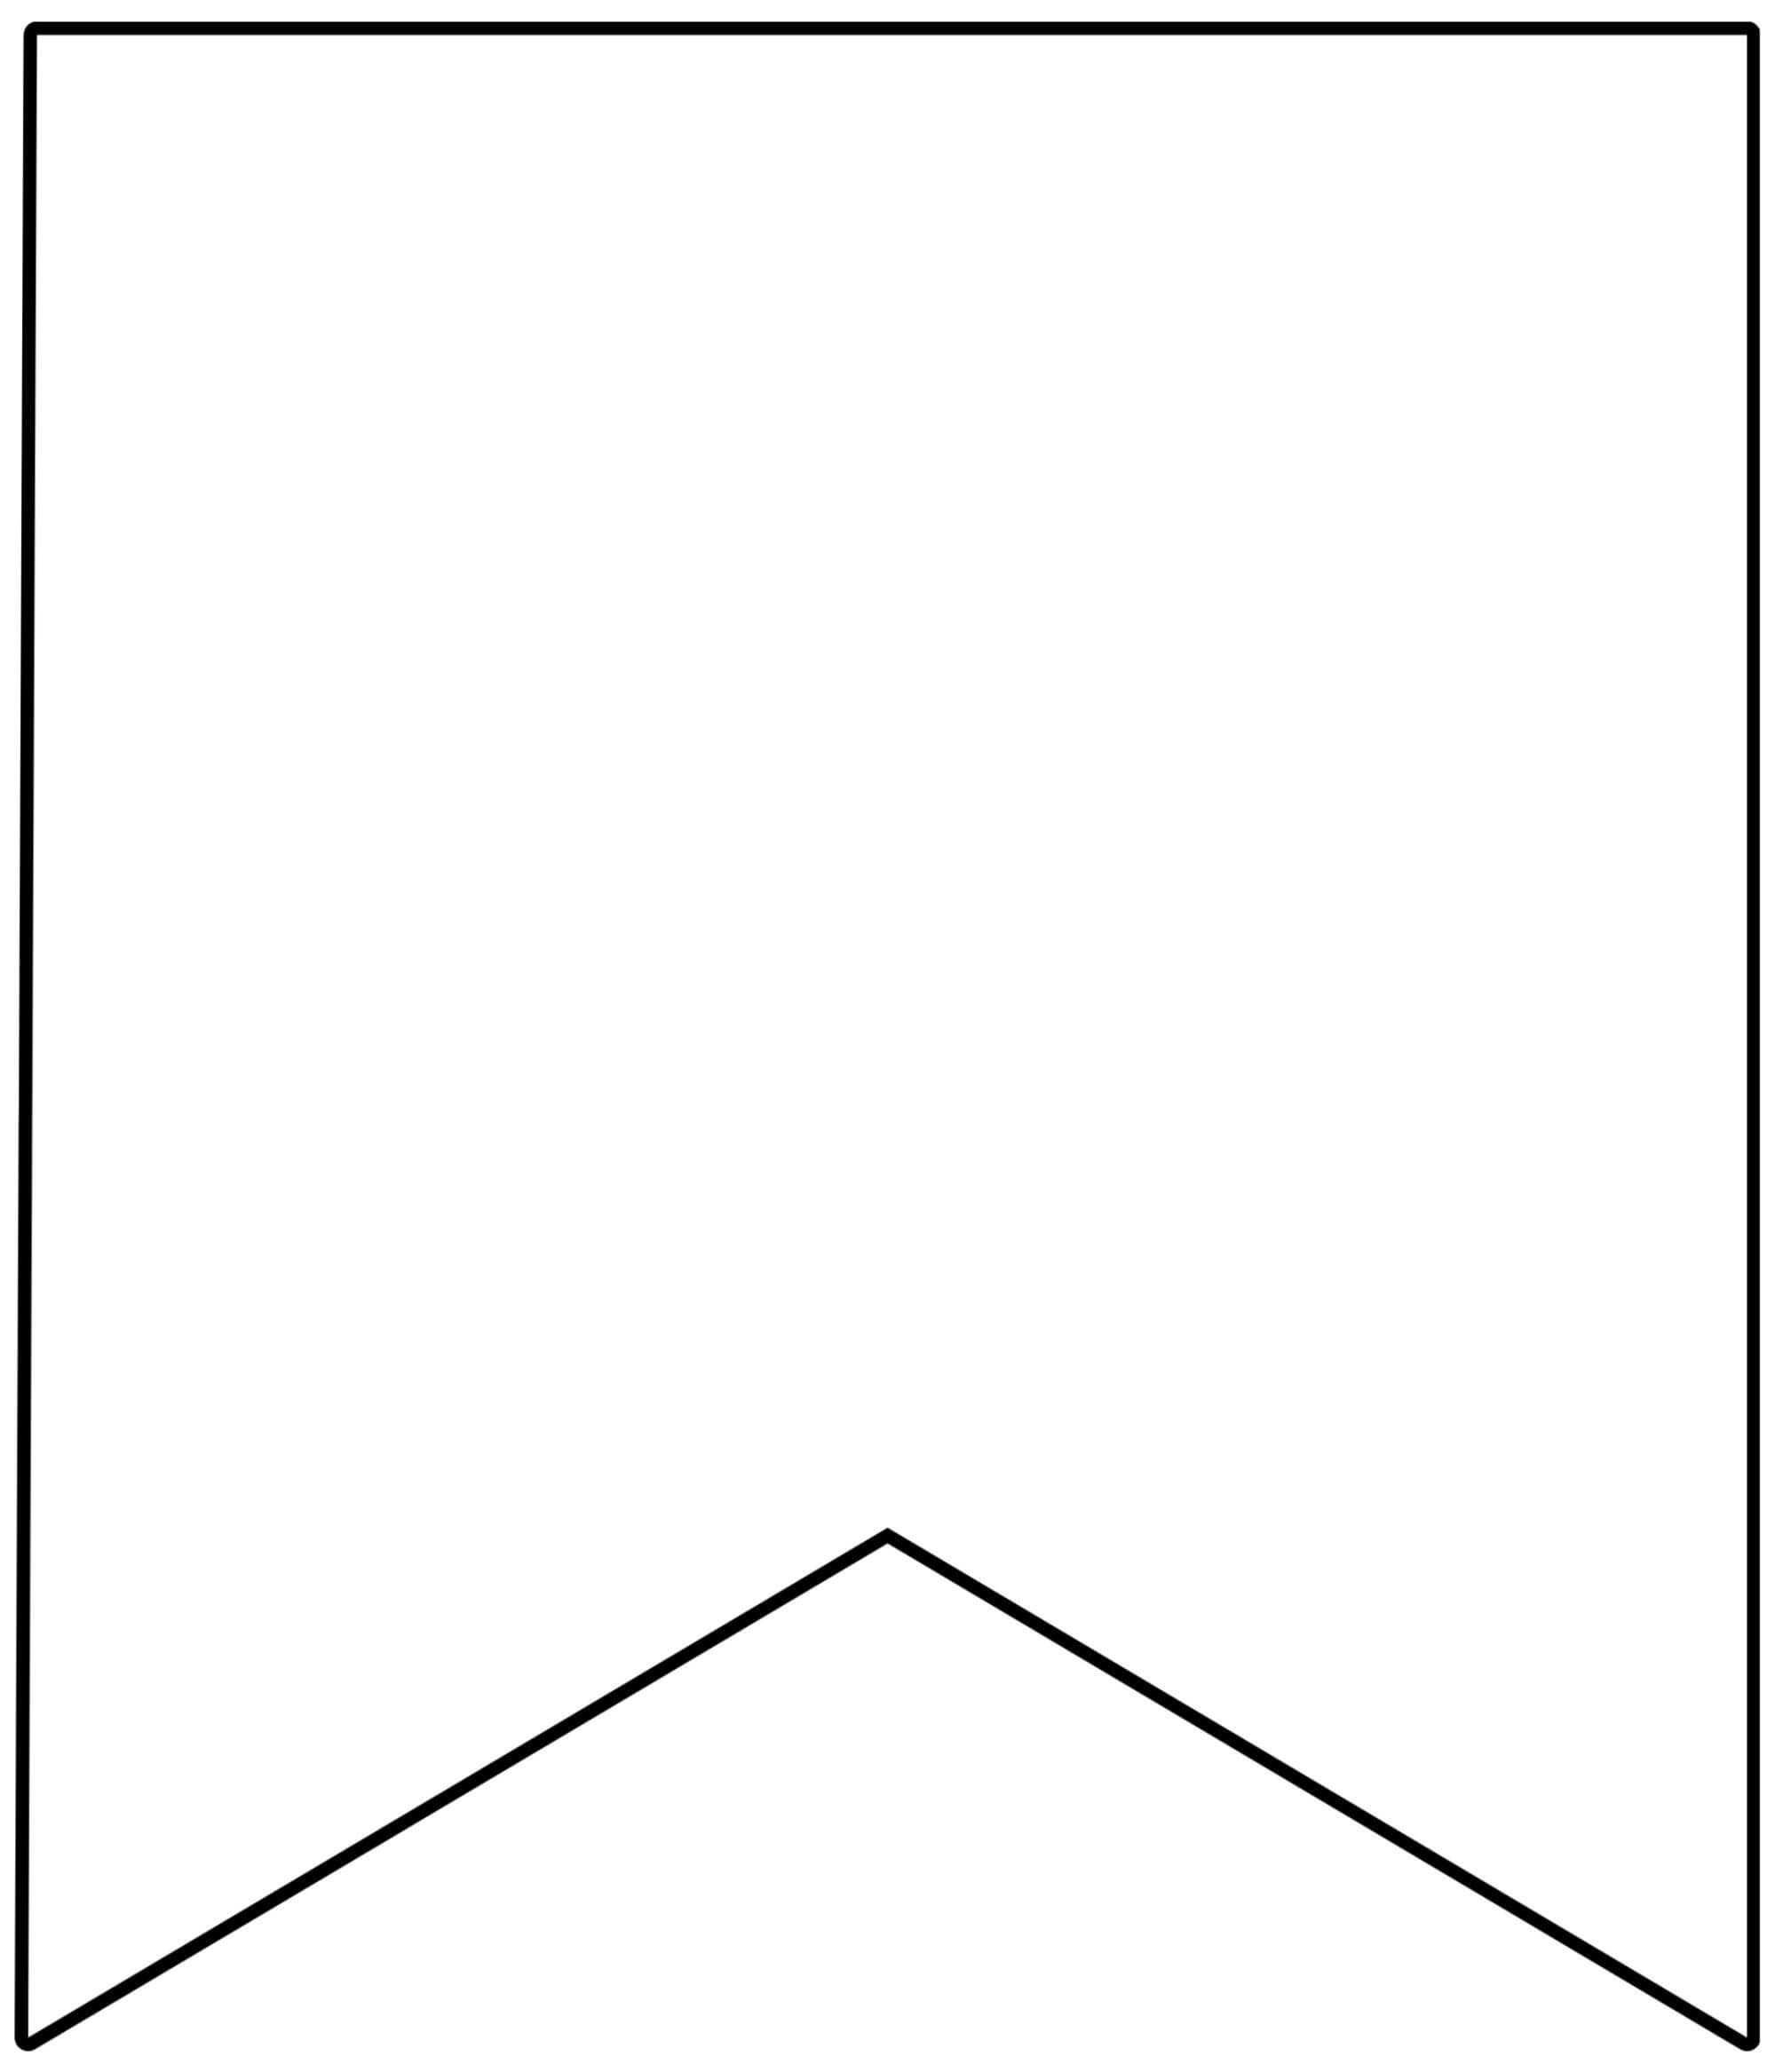 001 Template Ideas Free Printable Banner Singular Templates For Free Printable Banner Templates For Word